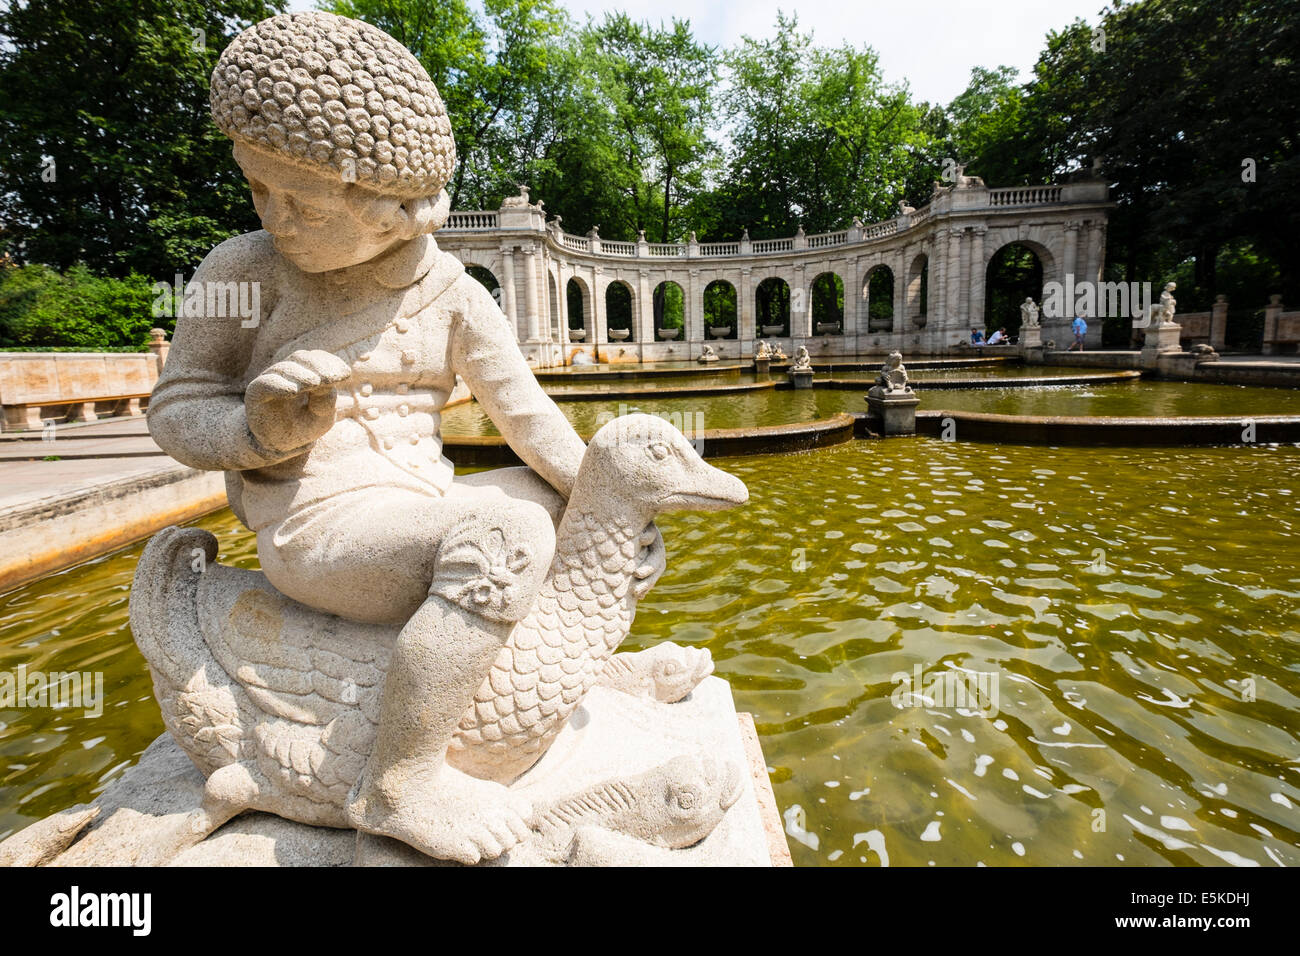 Marchenbrunnen Fairy Tale Fountain in Volkspark Friedrichshain Park Berlin Germany - Stock Image